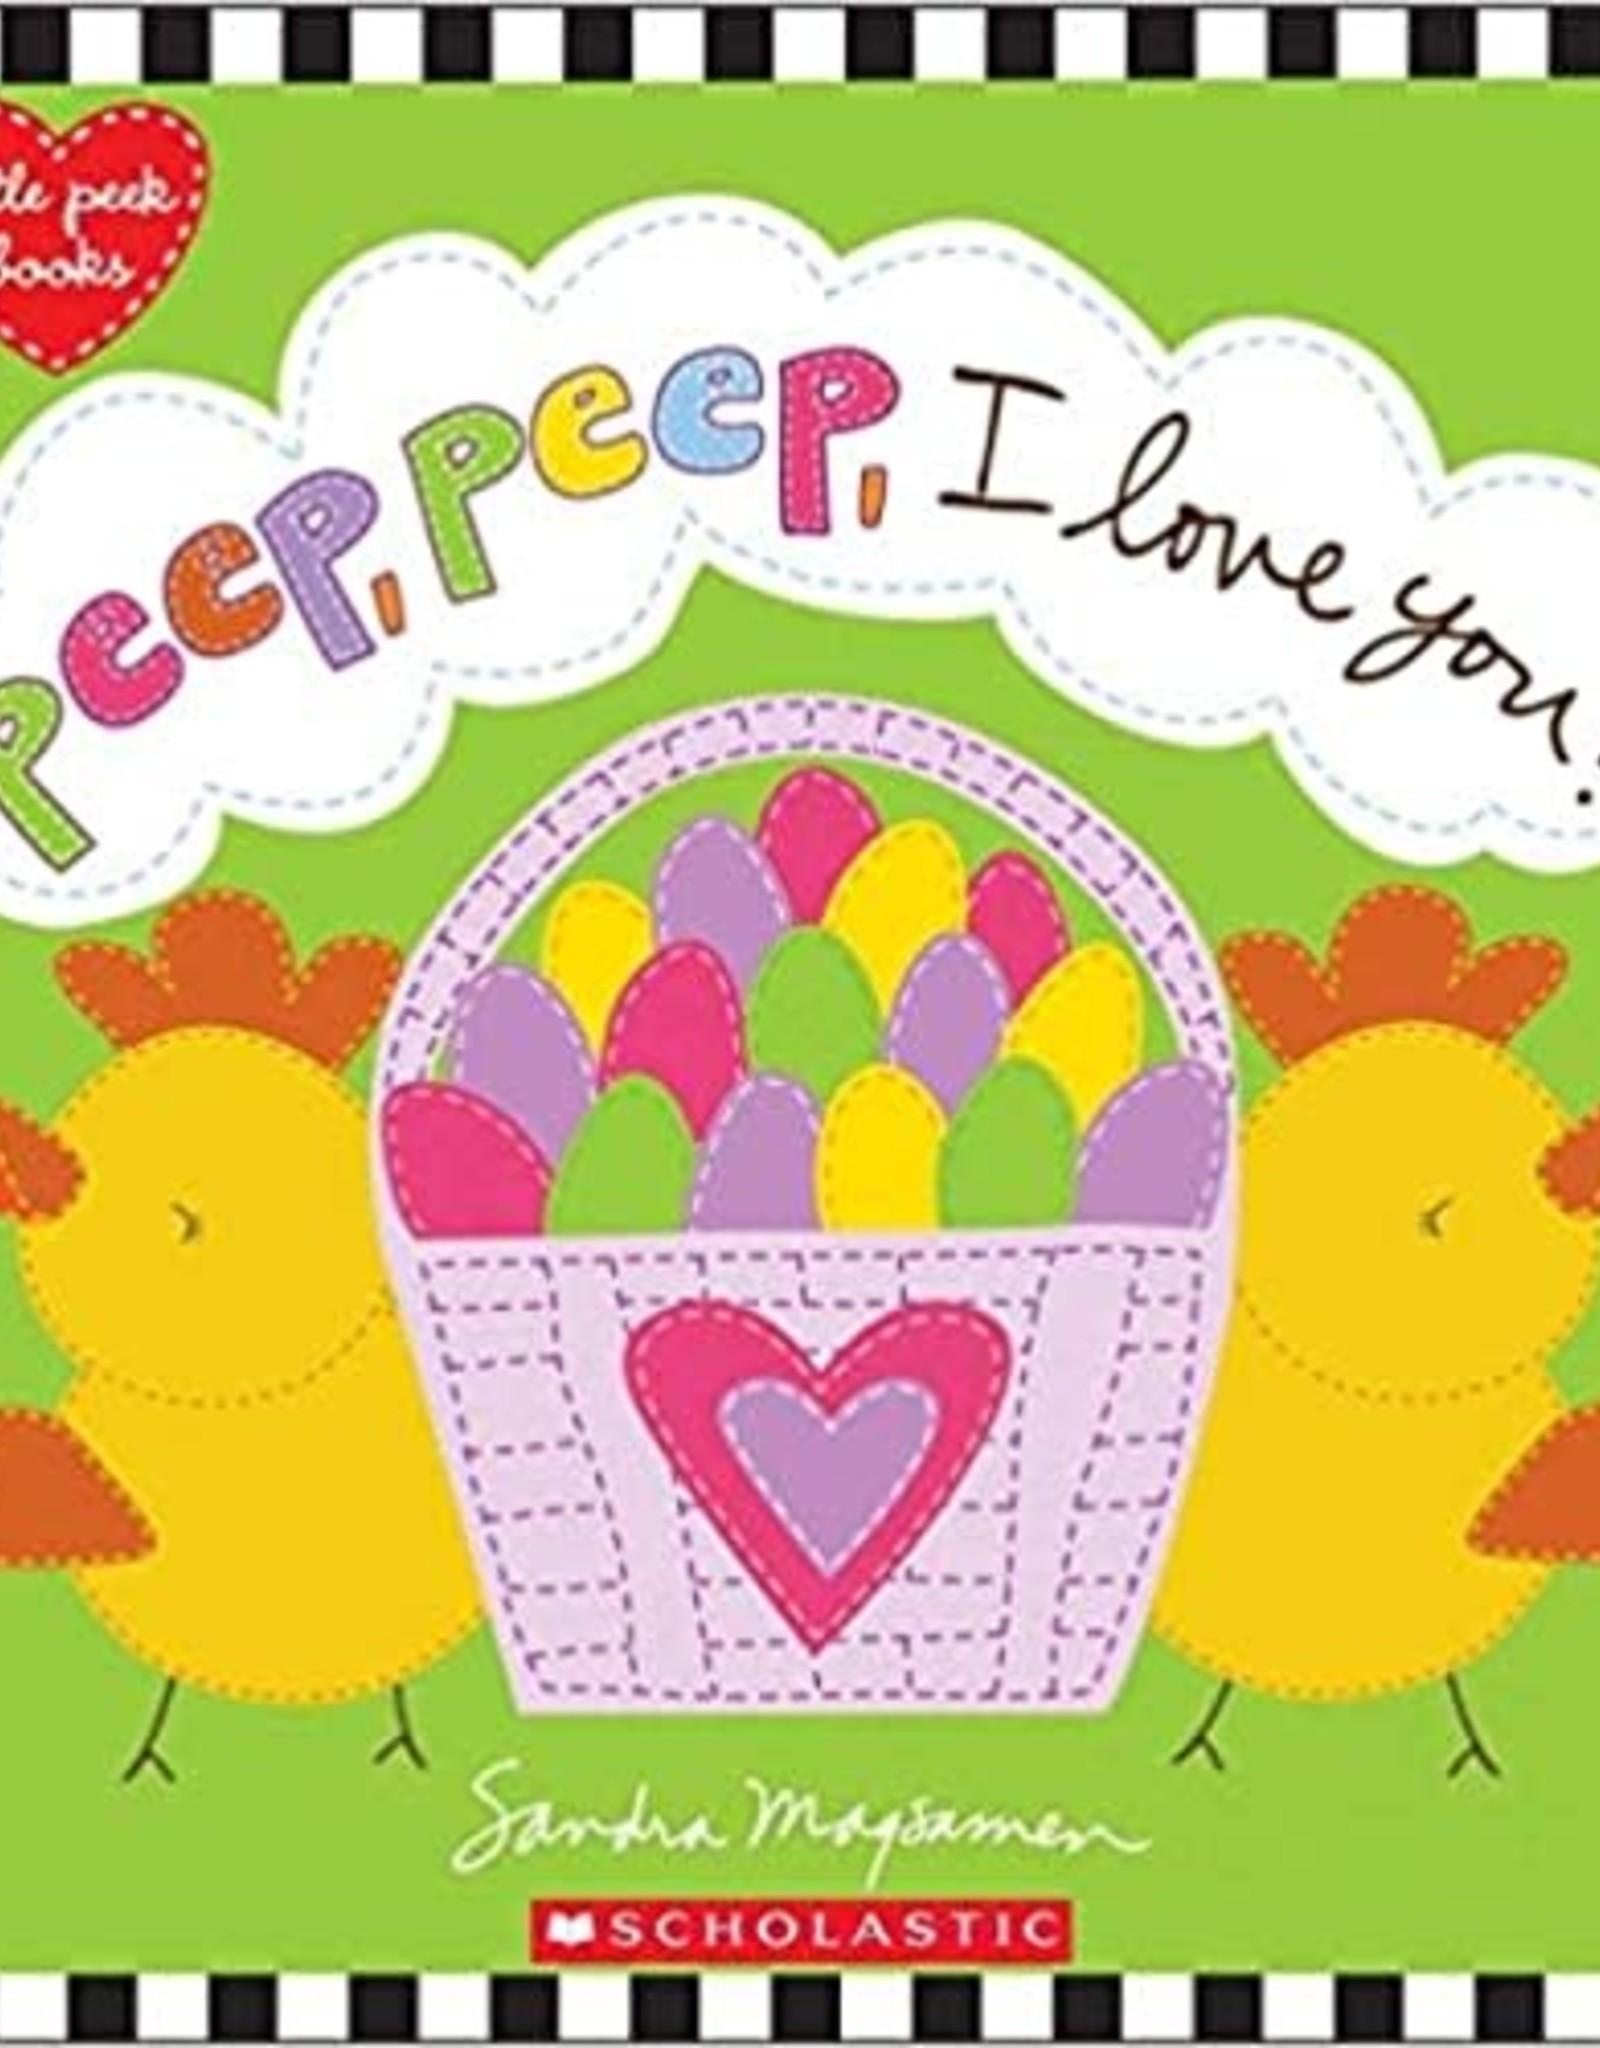 Scholastic Peep, Peep, I Love You!